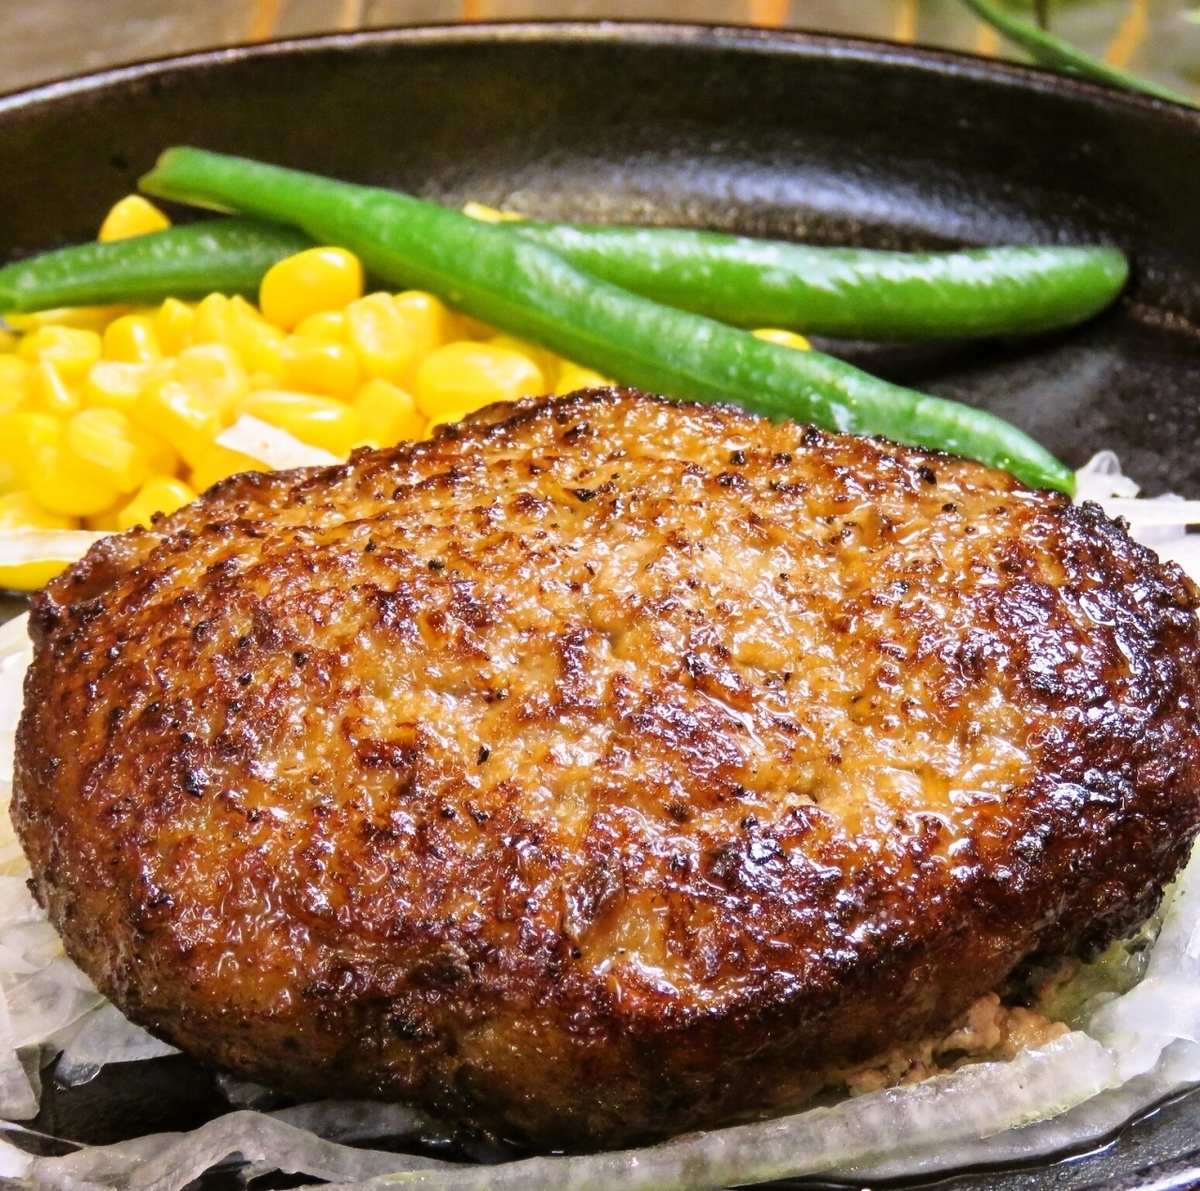 GOODDAYS原始汉堡牛排(200克)